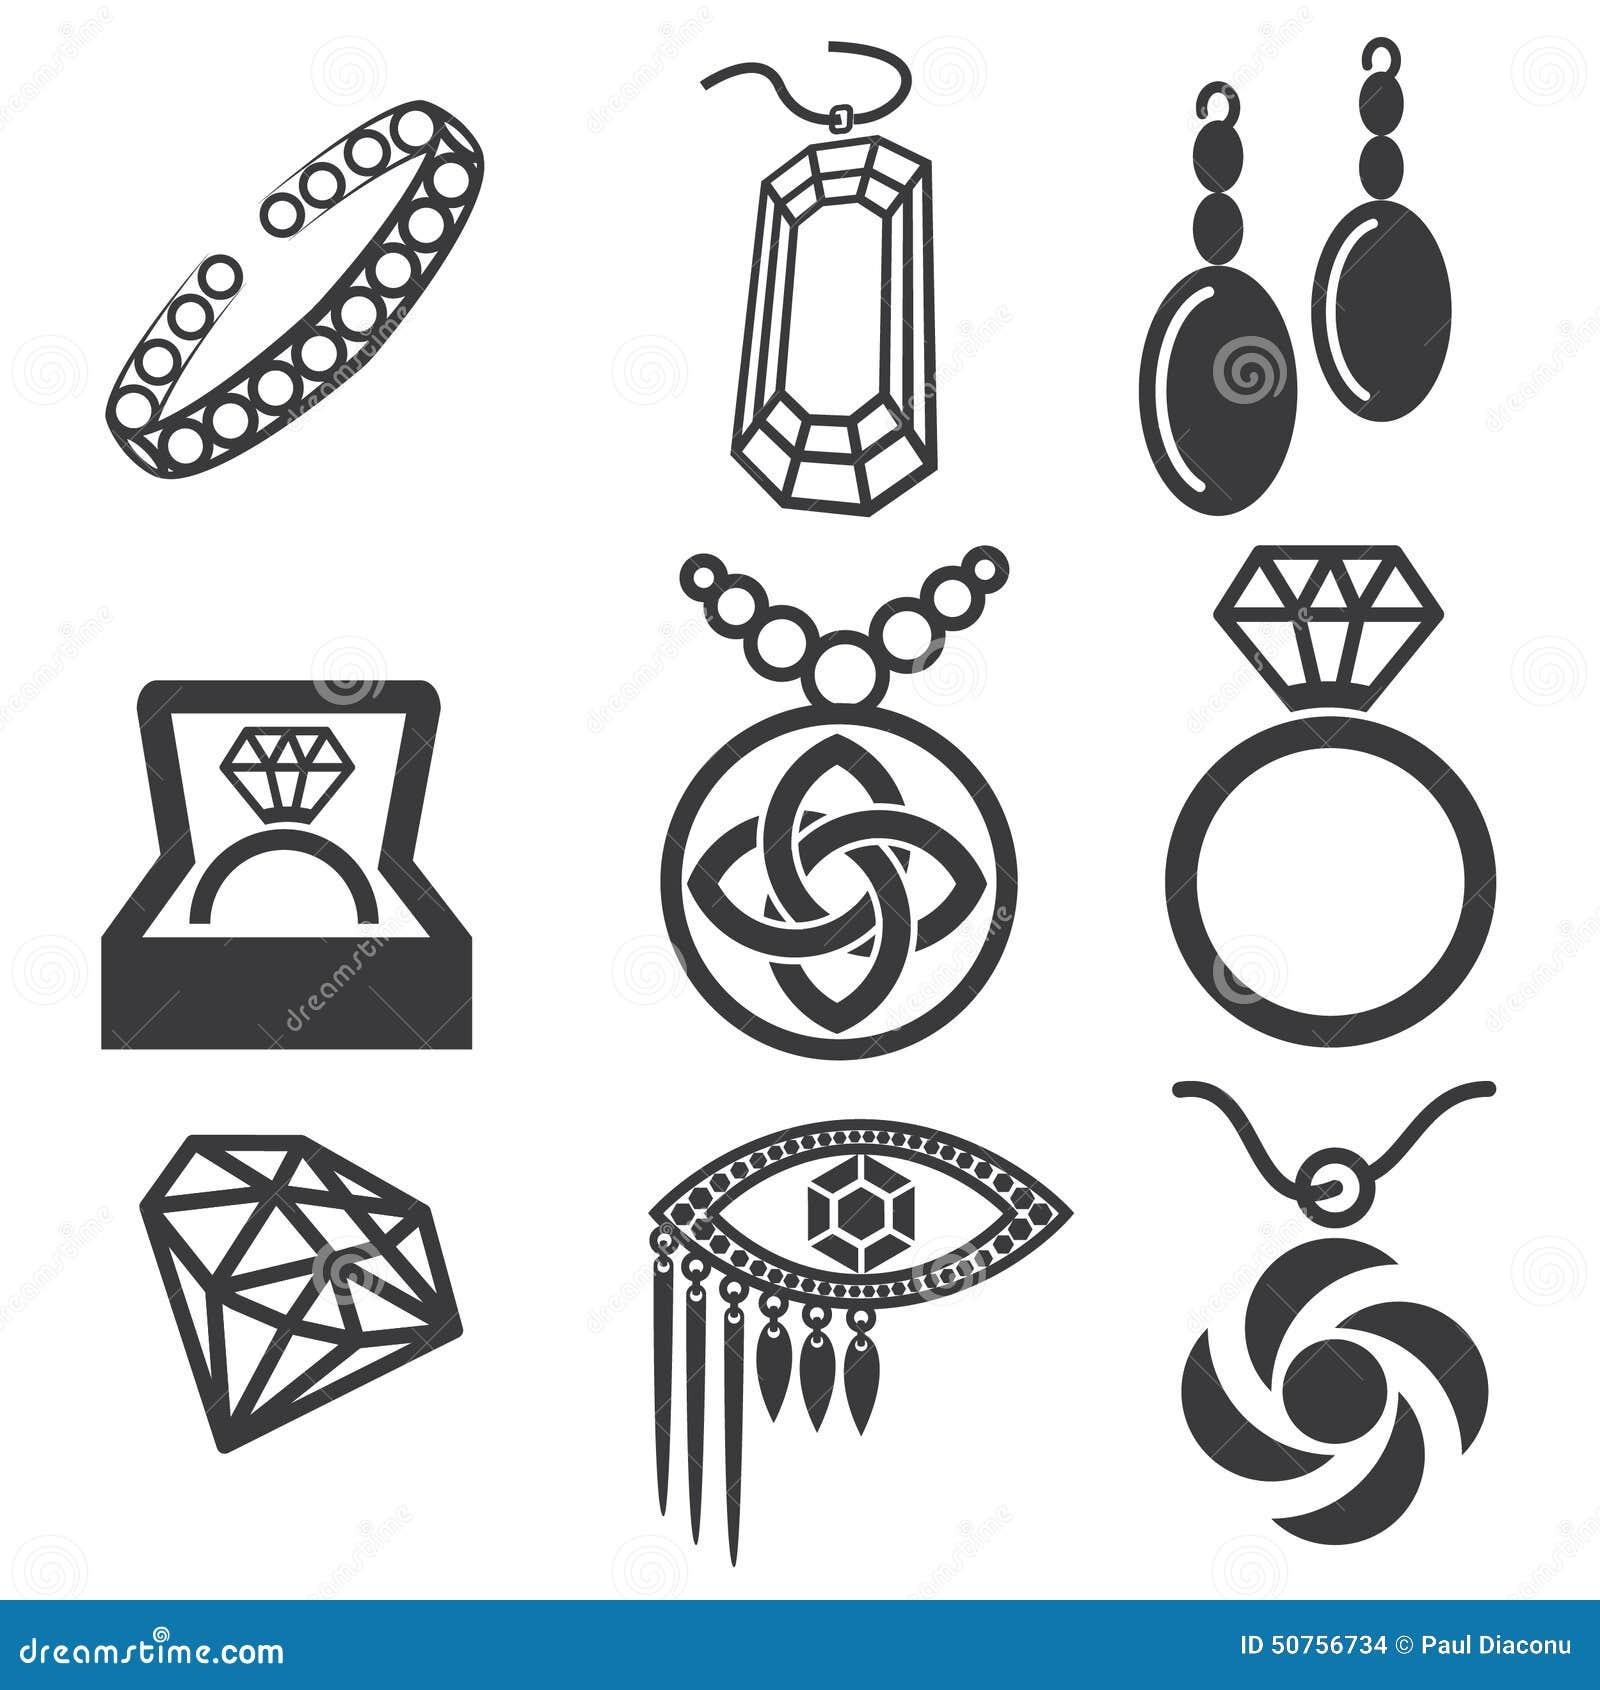 Jewelry Design Line Art : Jewelry mark set stock vector illustration of shapes